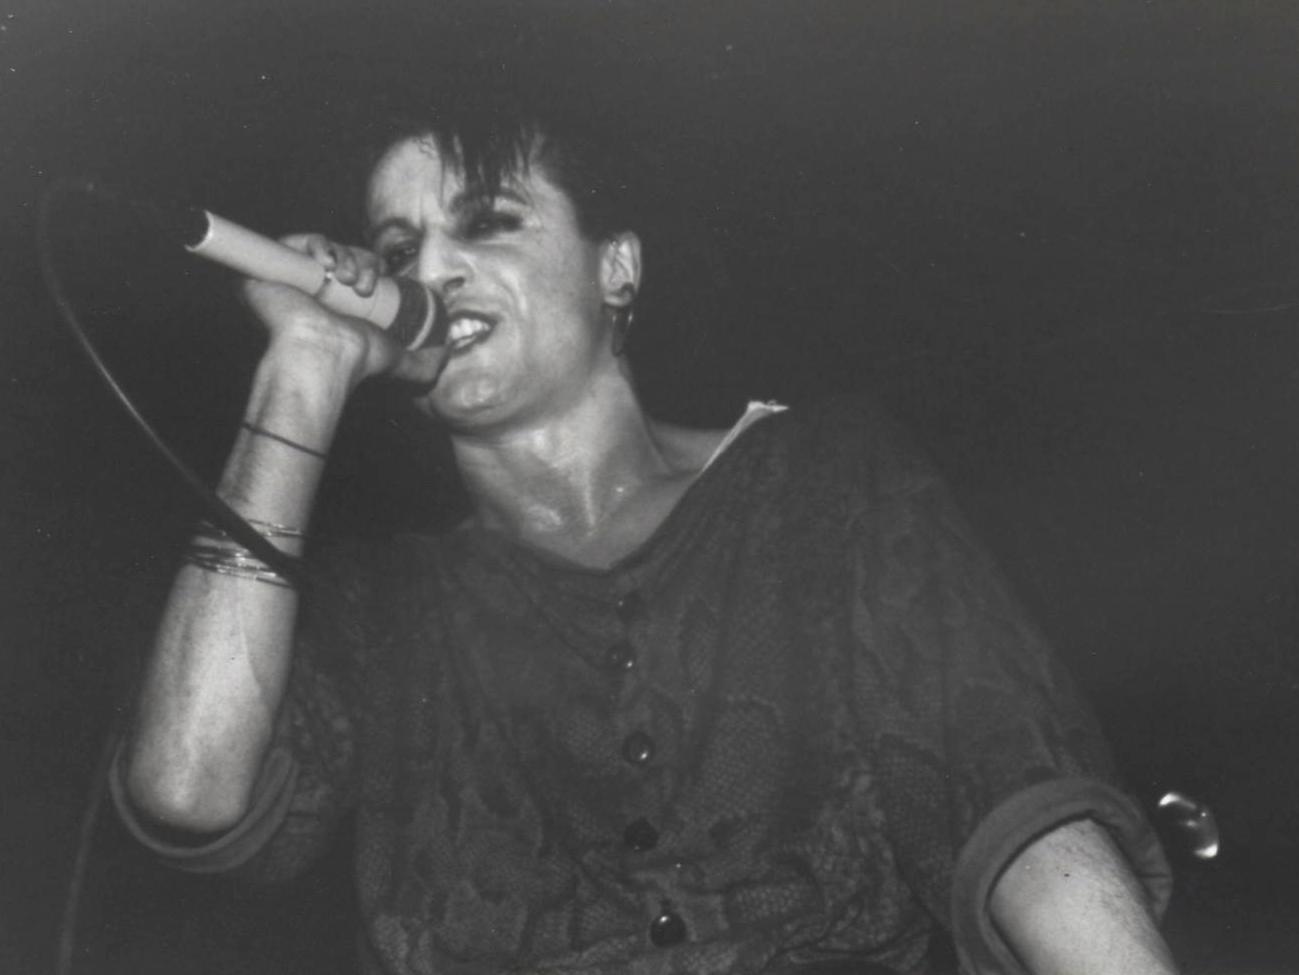 1985-03-09 i